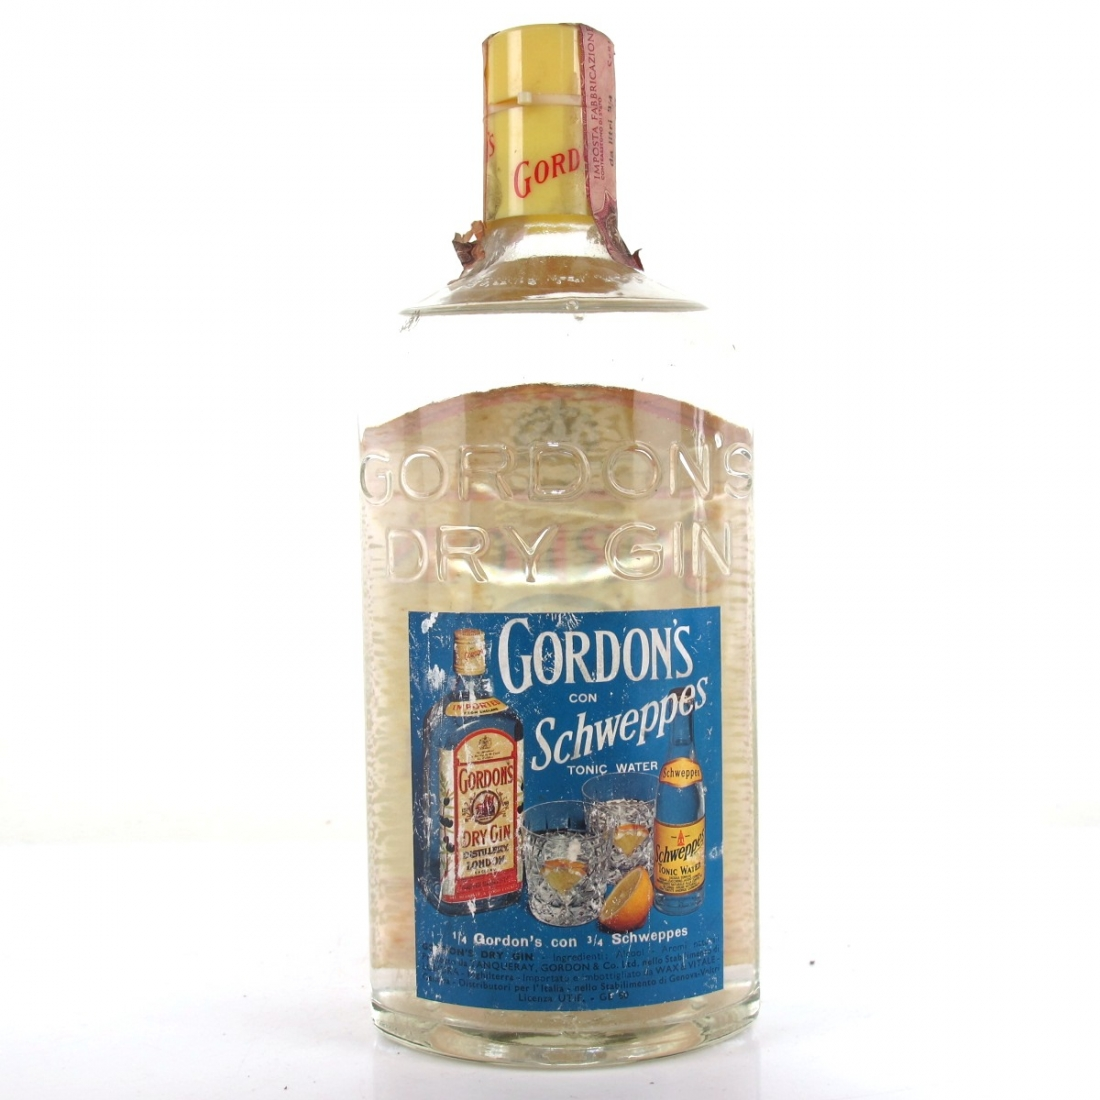 Gordon's Dry Gin 1960s